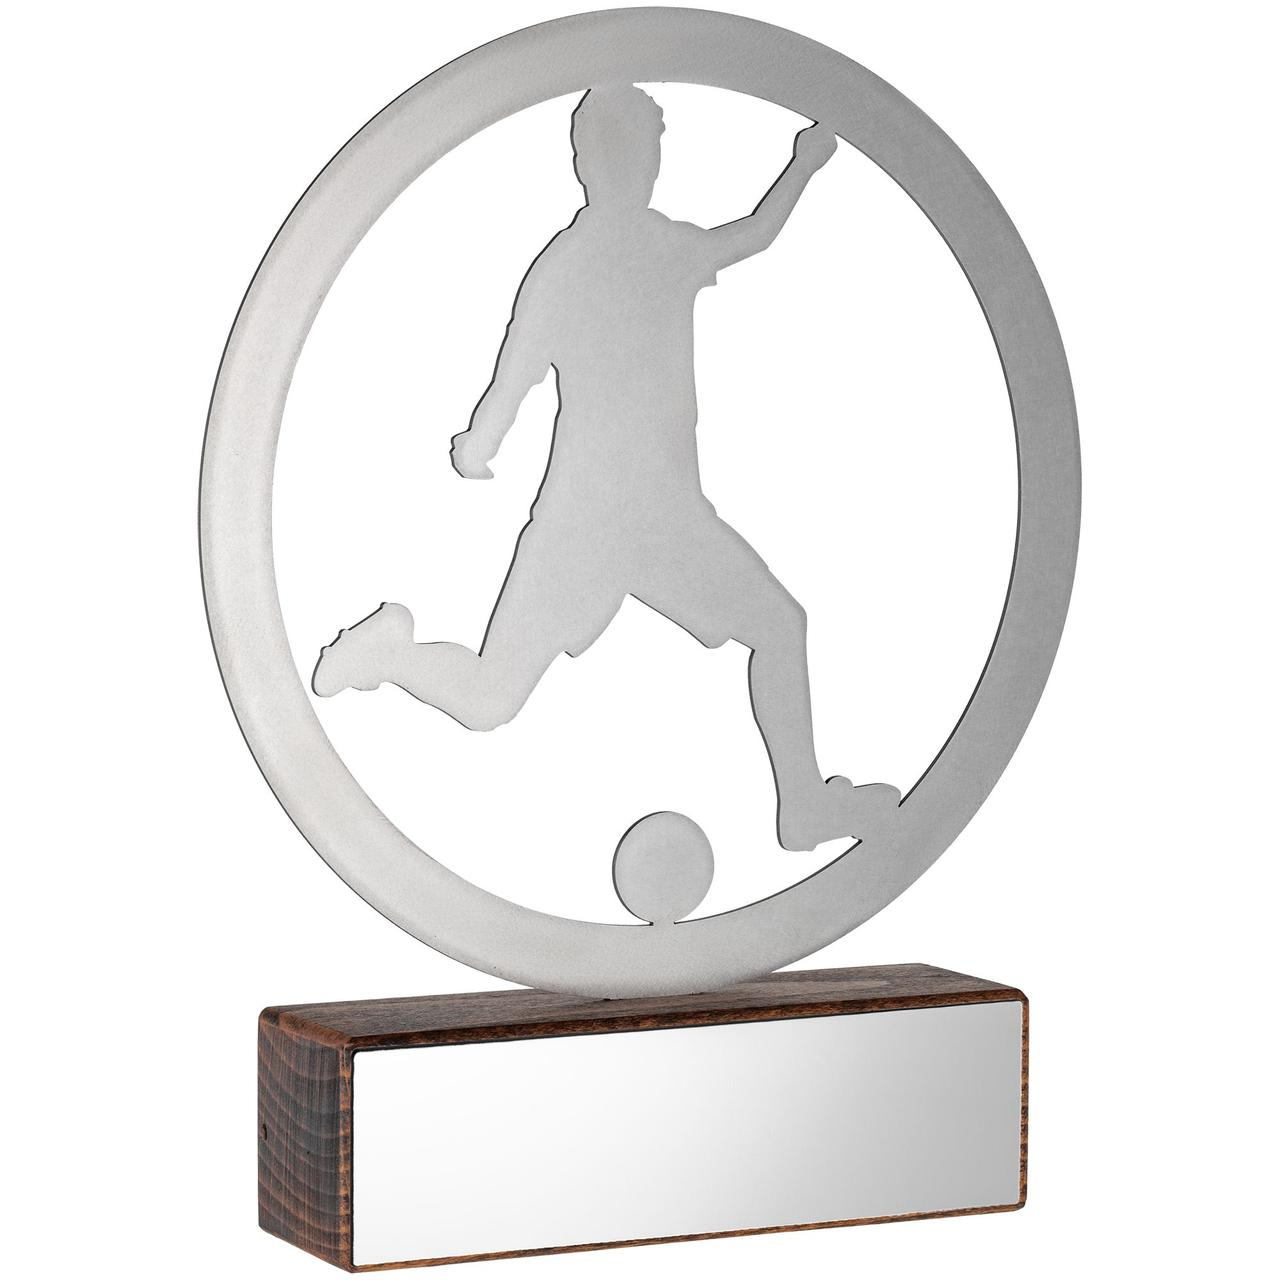 Награда Acme, футбол (артикул 70156.03)